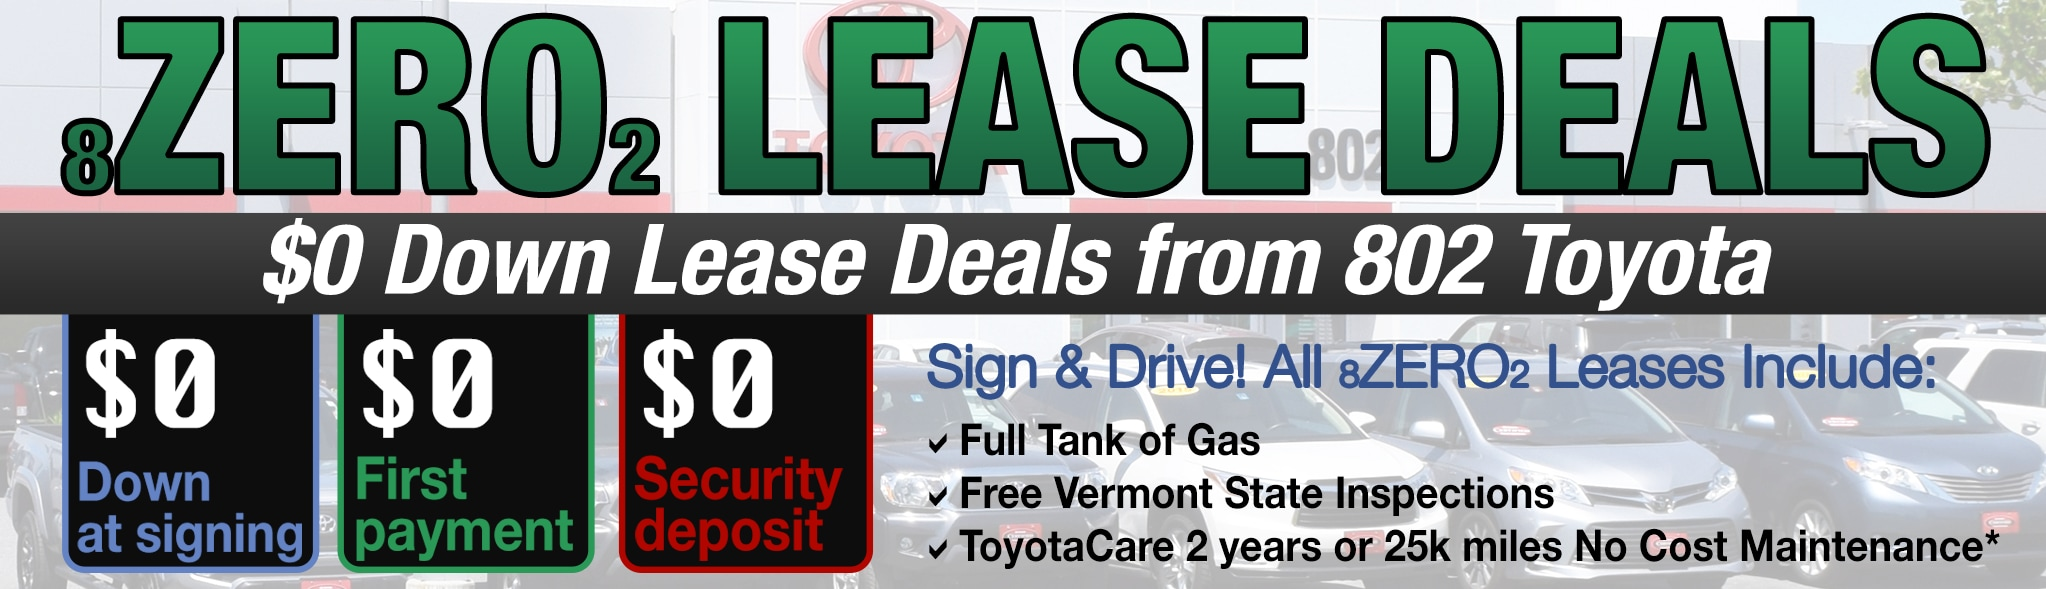 Zero Down Lease Deals >> Zero Down Toyota Lease Deals 802 Toyota Of Vermont